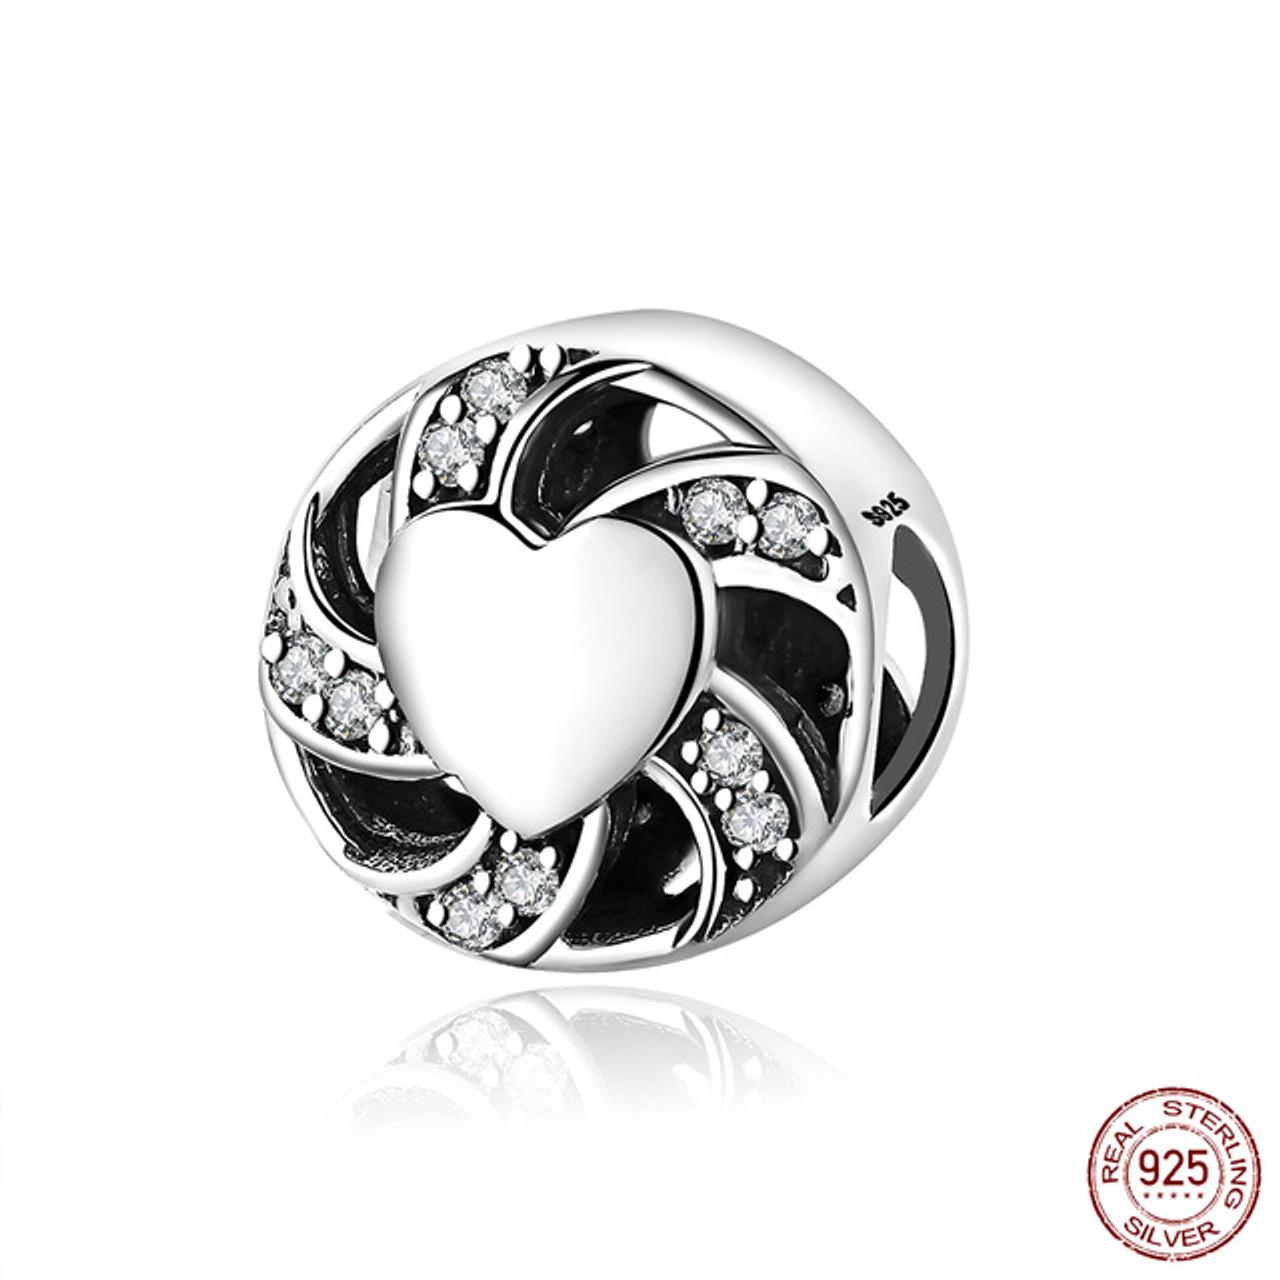 e81f83548 ... 12 Style Authentic 925 Sterling Silver Heart Shape Beads Charm Fit  pandora Charm Bracelet DIY Original ...